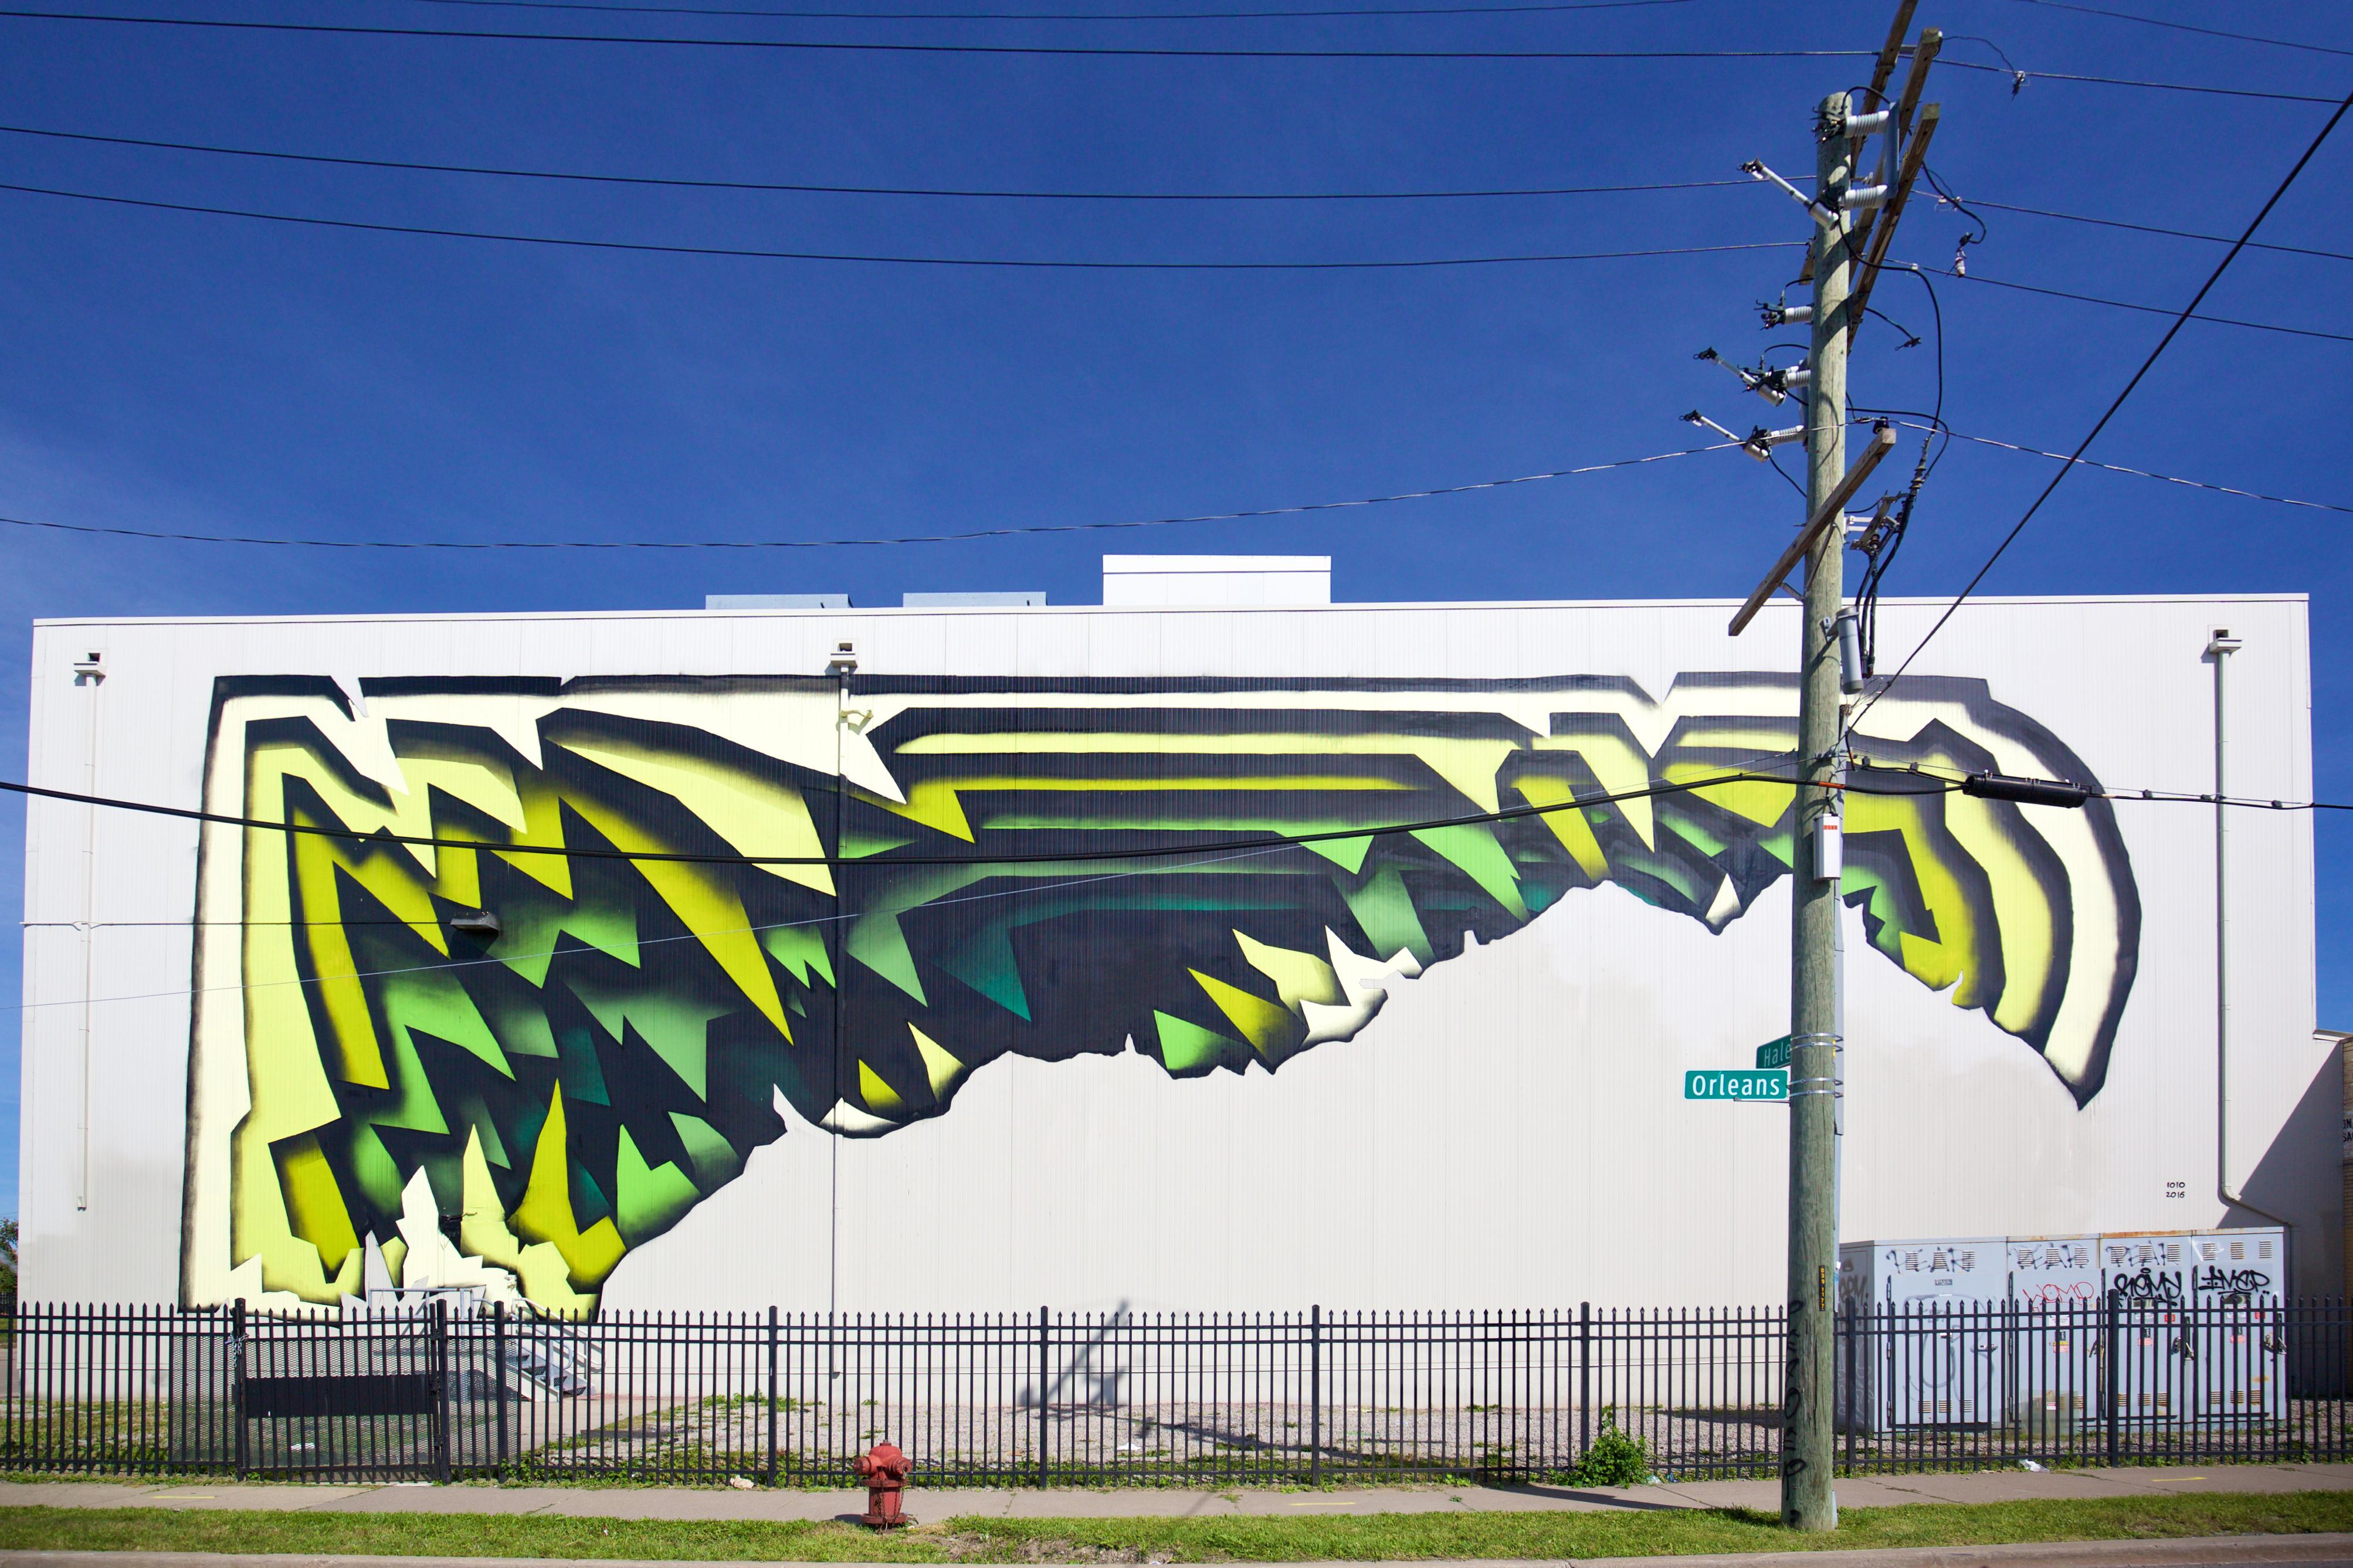 1010_muralsinthemarket_1xrun_finished-walls-1